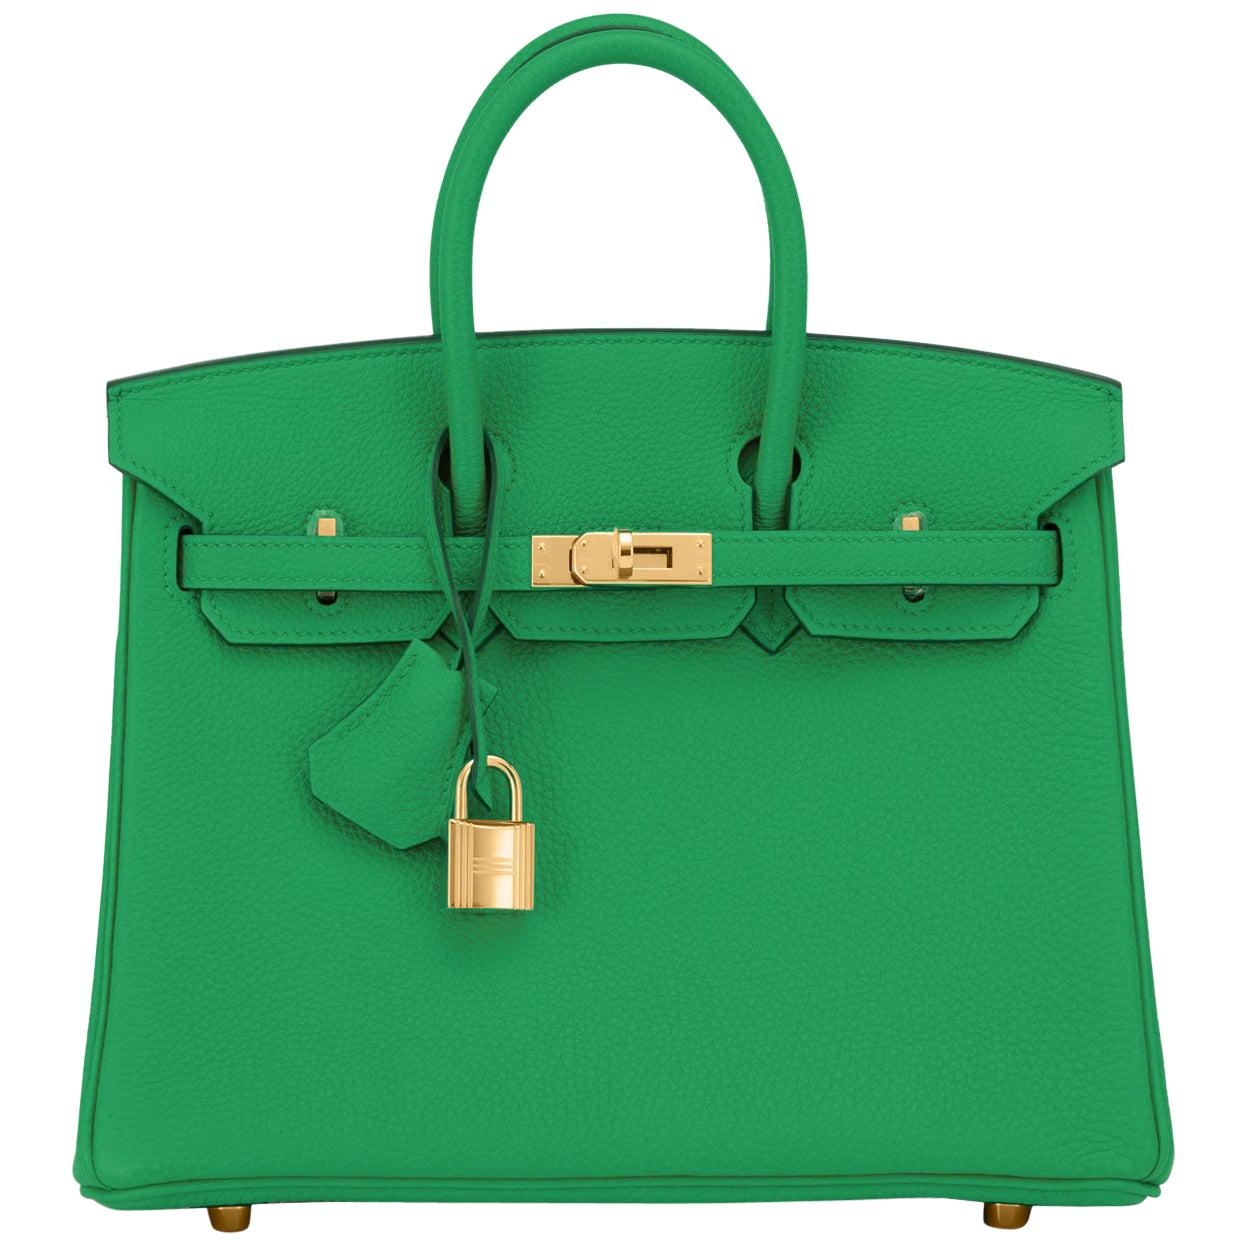 Hermes Birkin 25 Bambou Green Bamboo Gold Hardware Bag Y Stamp, 2020